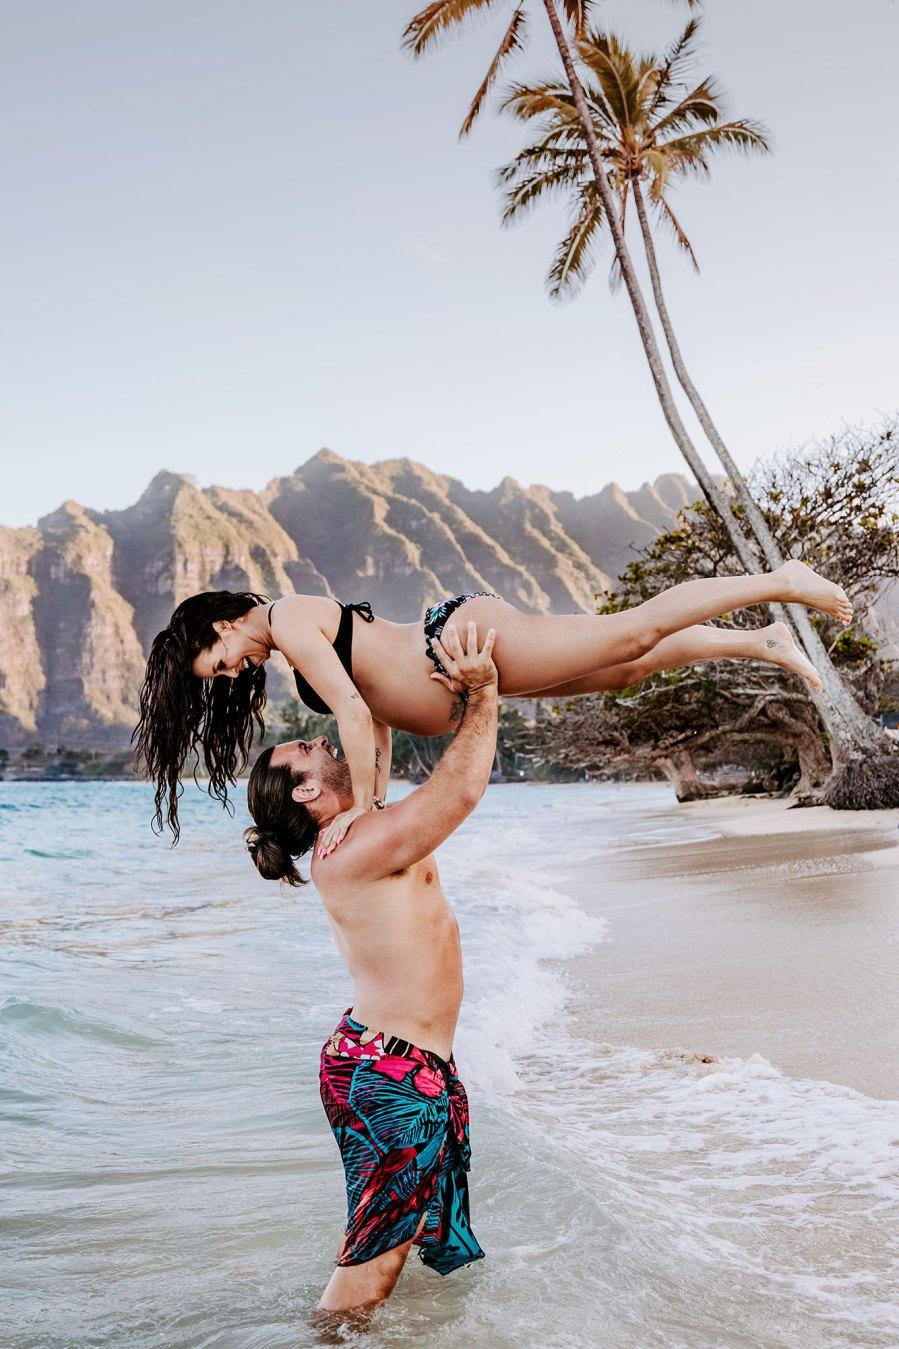 Pregnant Scheana Shay Shares Maternity Shoot Photos From Hawaii Babymoon With Brock Davies